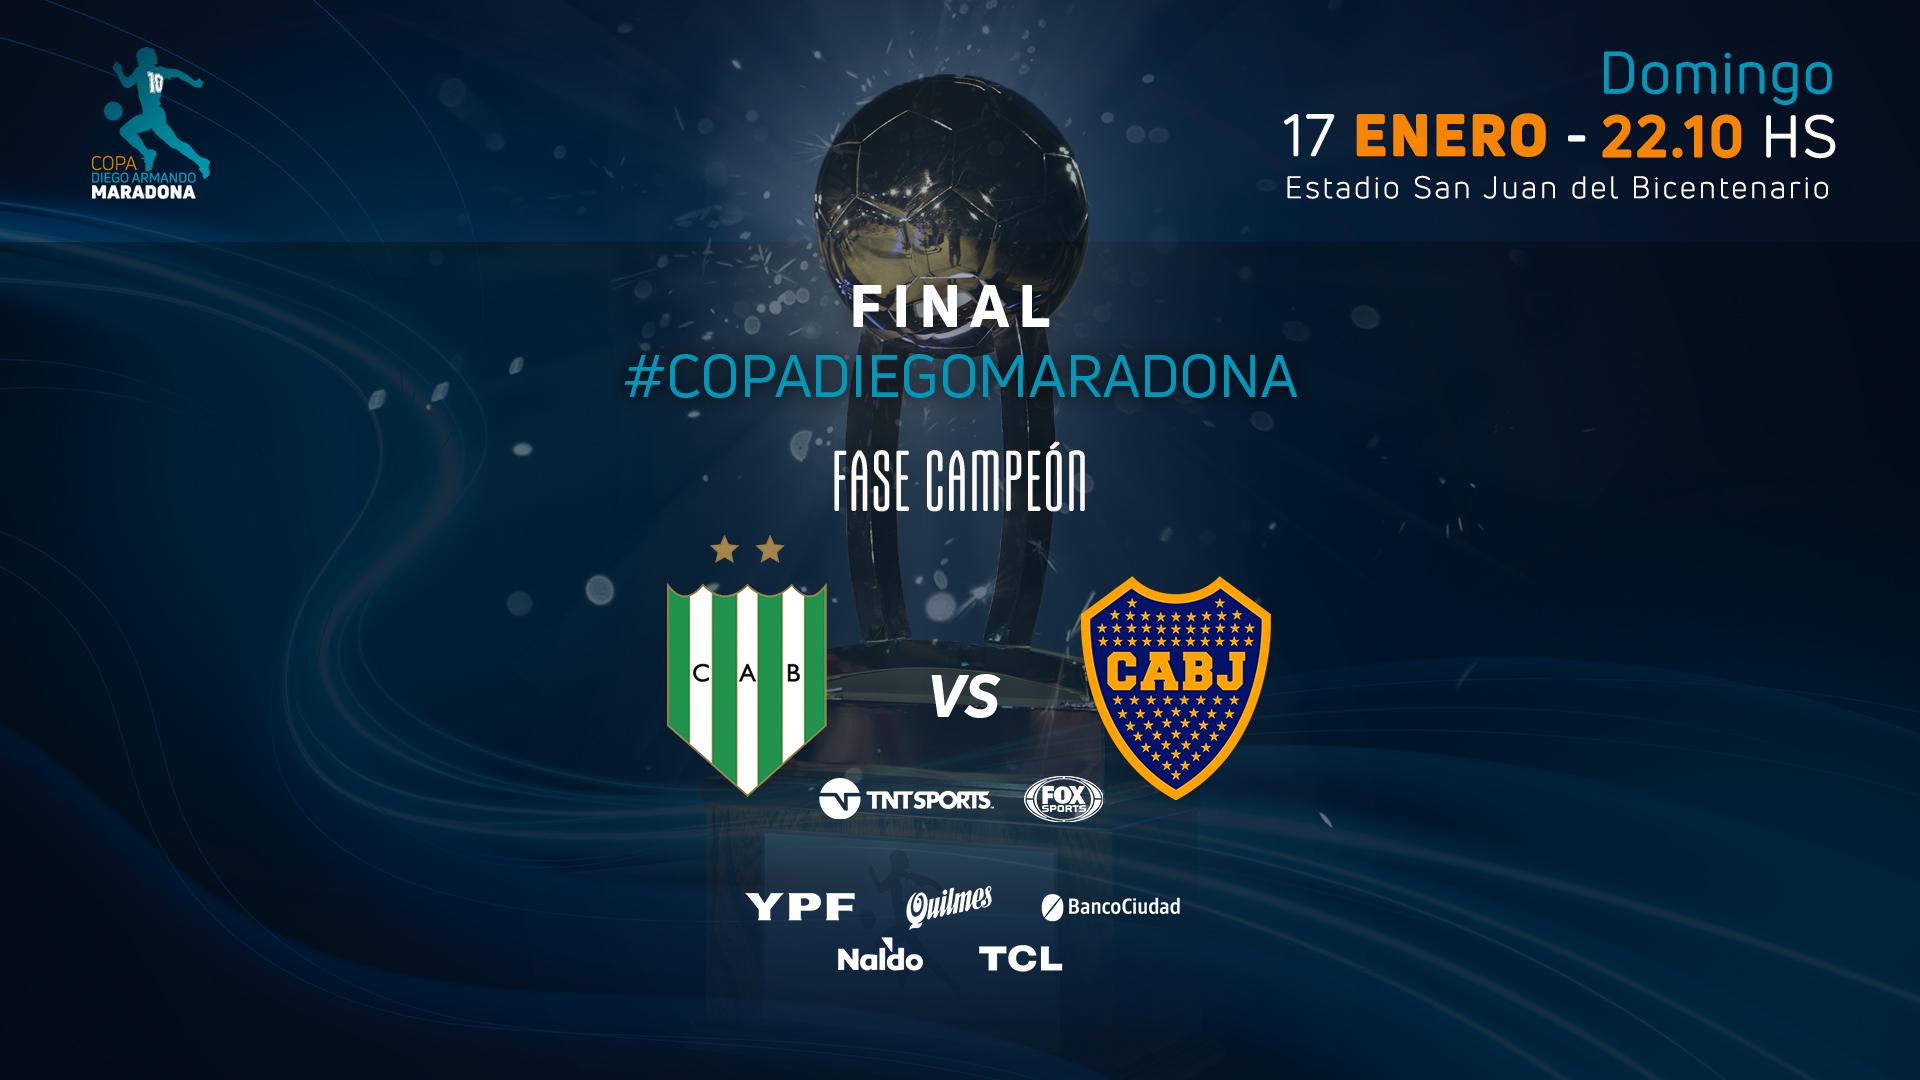 Banfield vs Boca: chi alzerà la Copa Maradona?